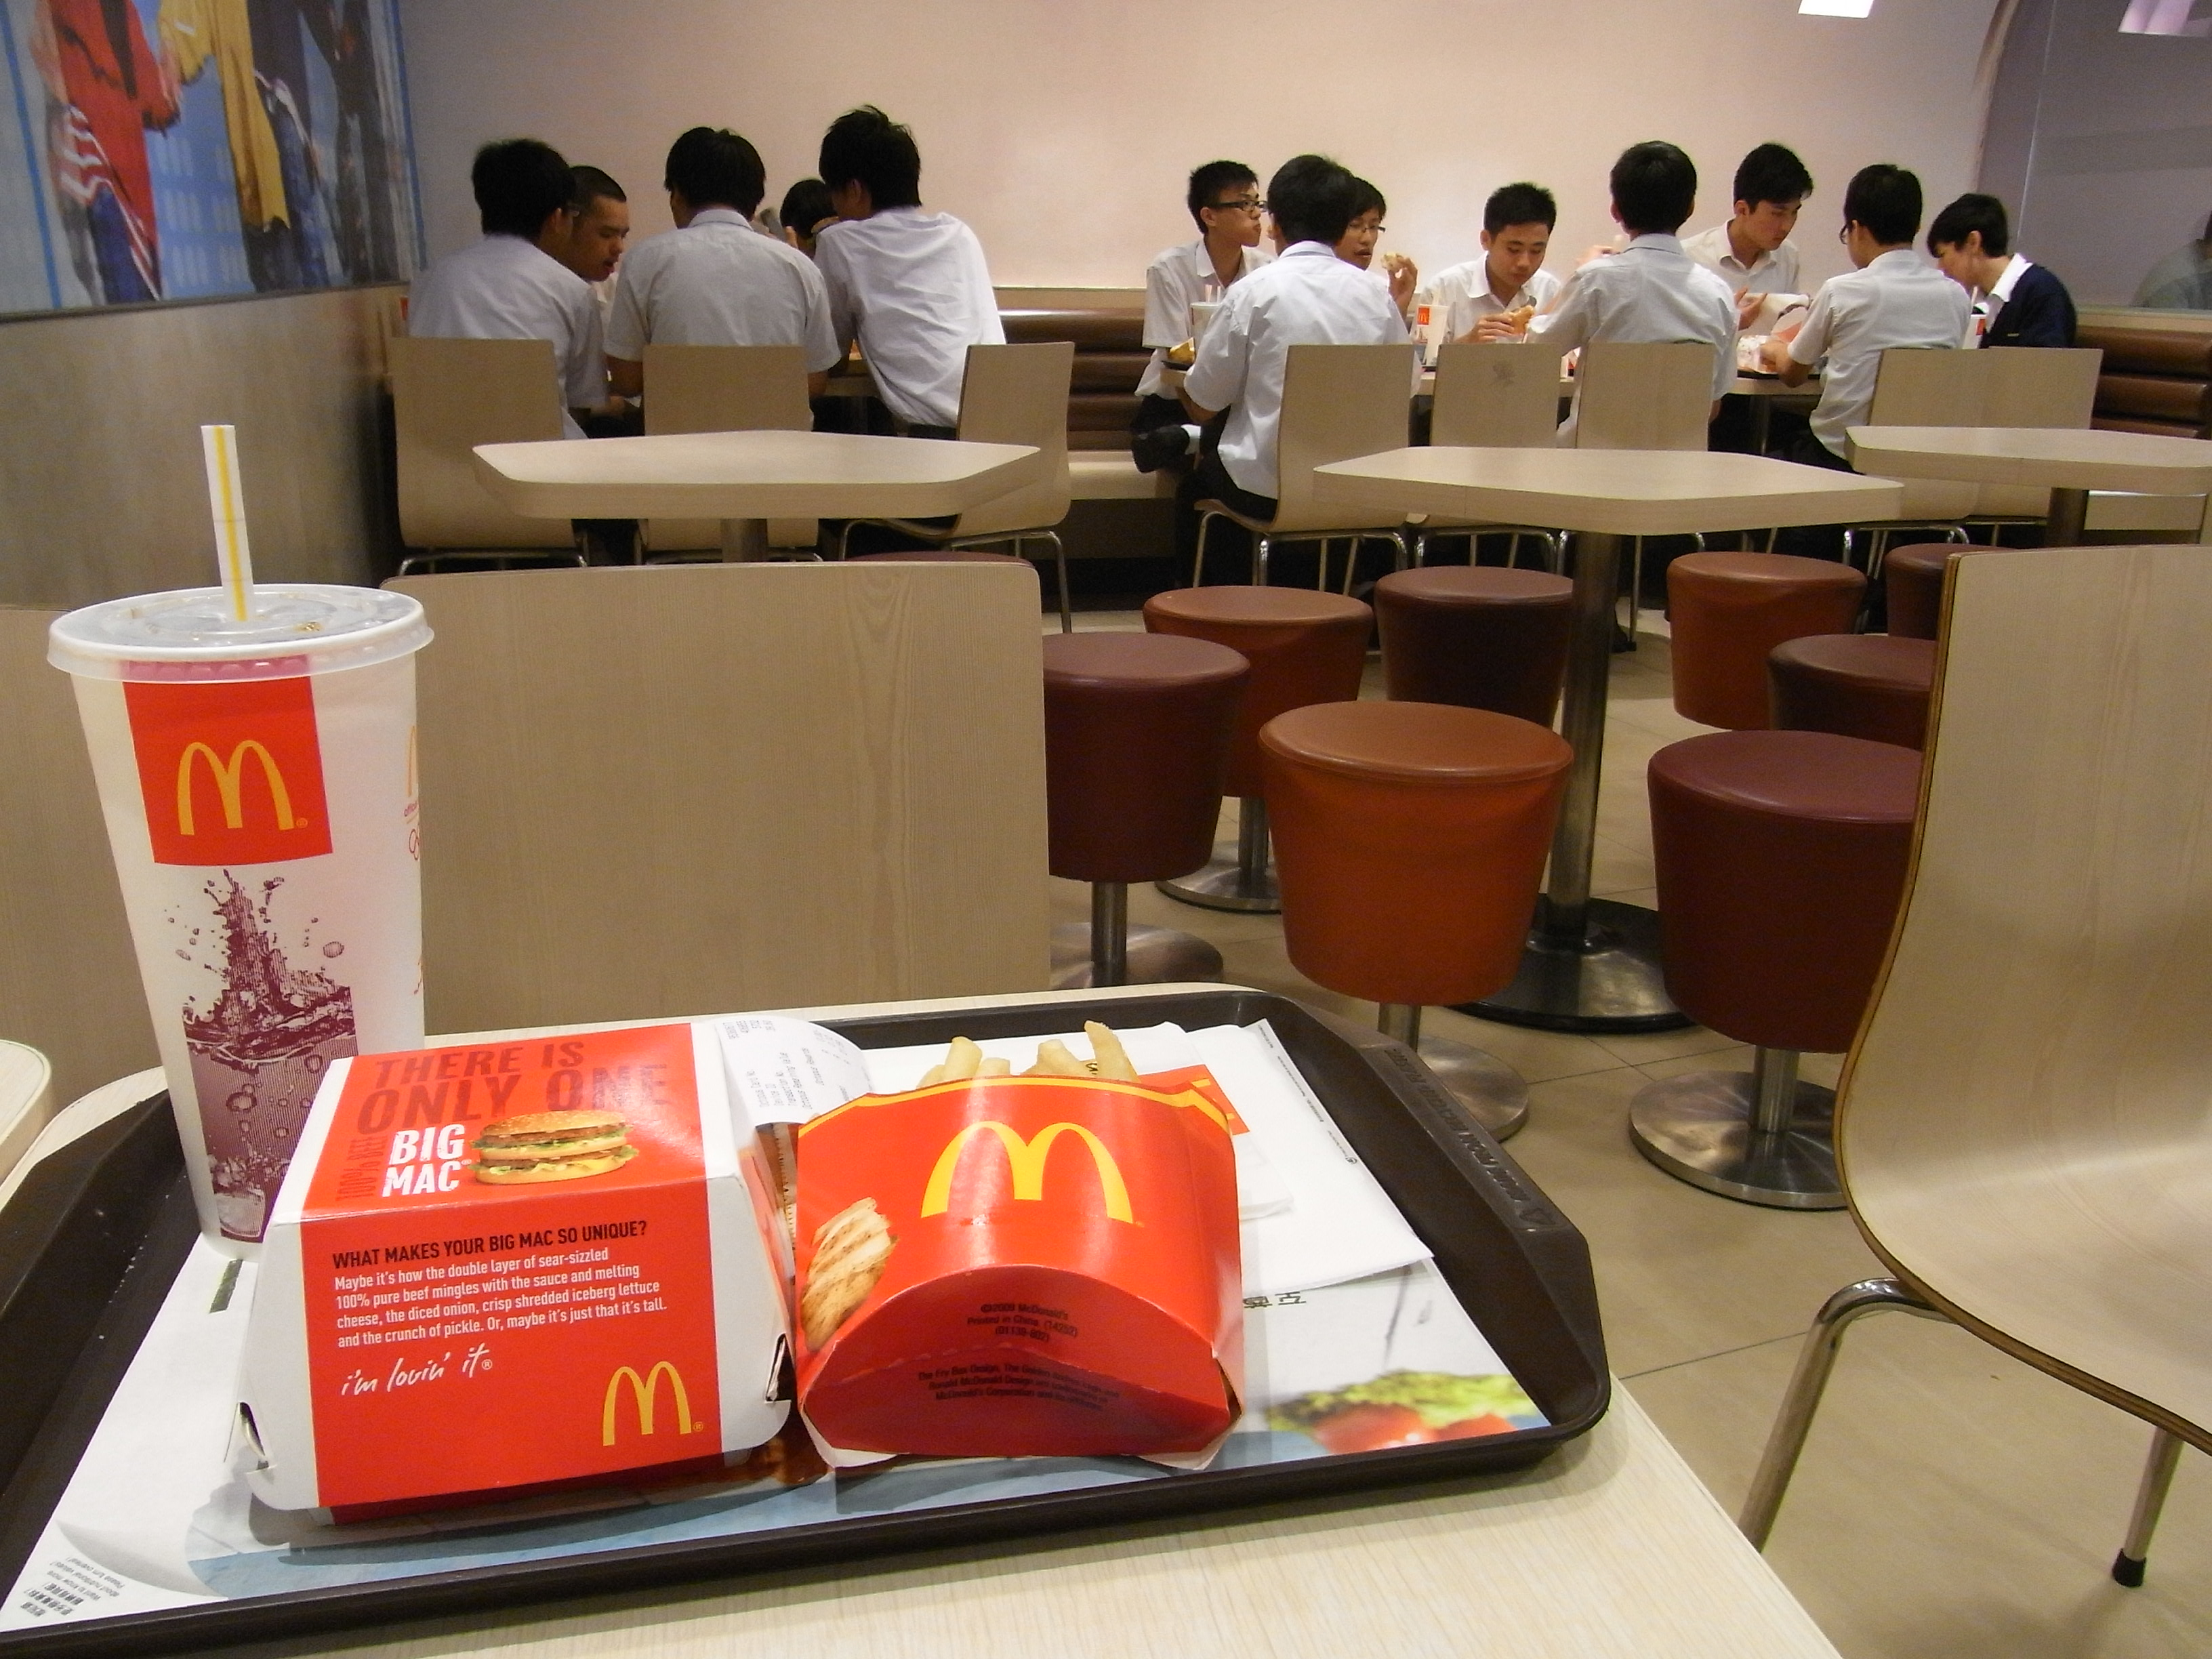 HK_%E9%BA%A5%E7%95%B6%E5%8B%9E%E9%A4%90%E5%BB%B3_McDonalds_restaurant_interior_May-2012.JPG?profile=RESIZE_710x